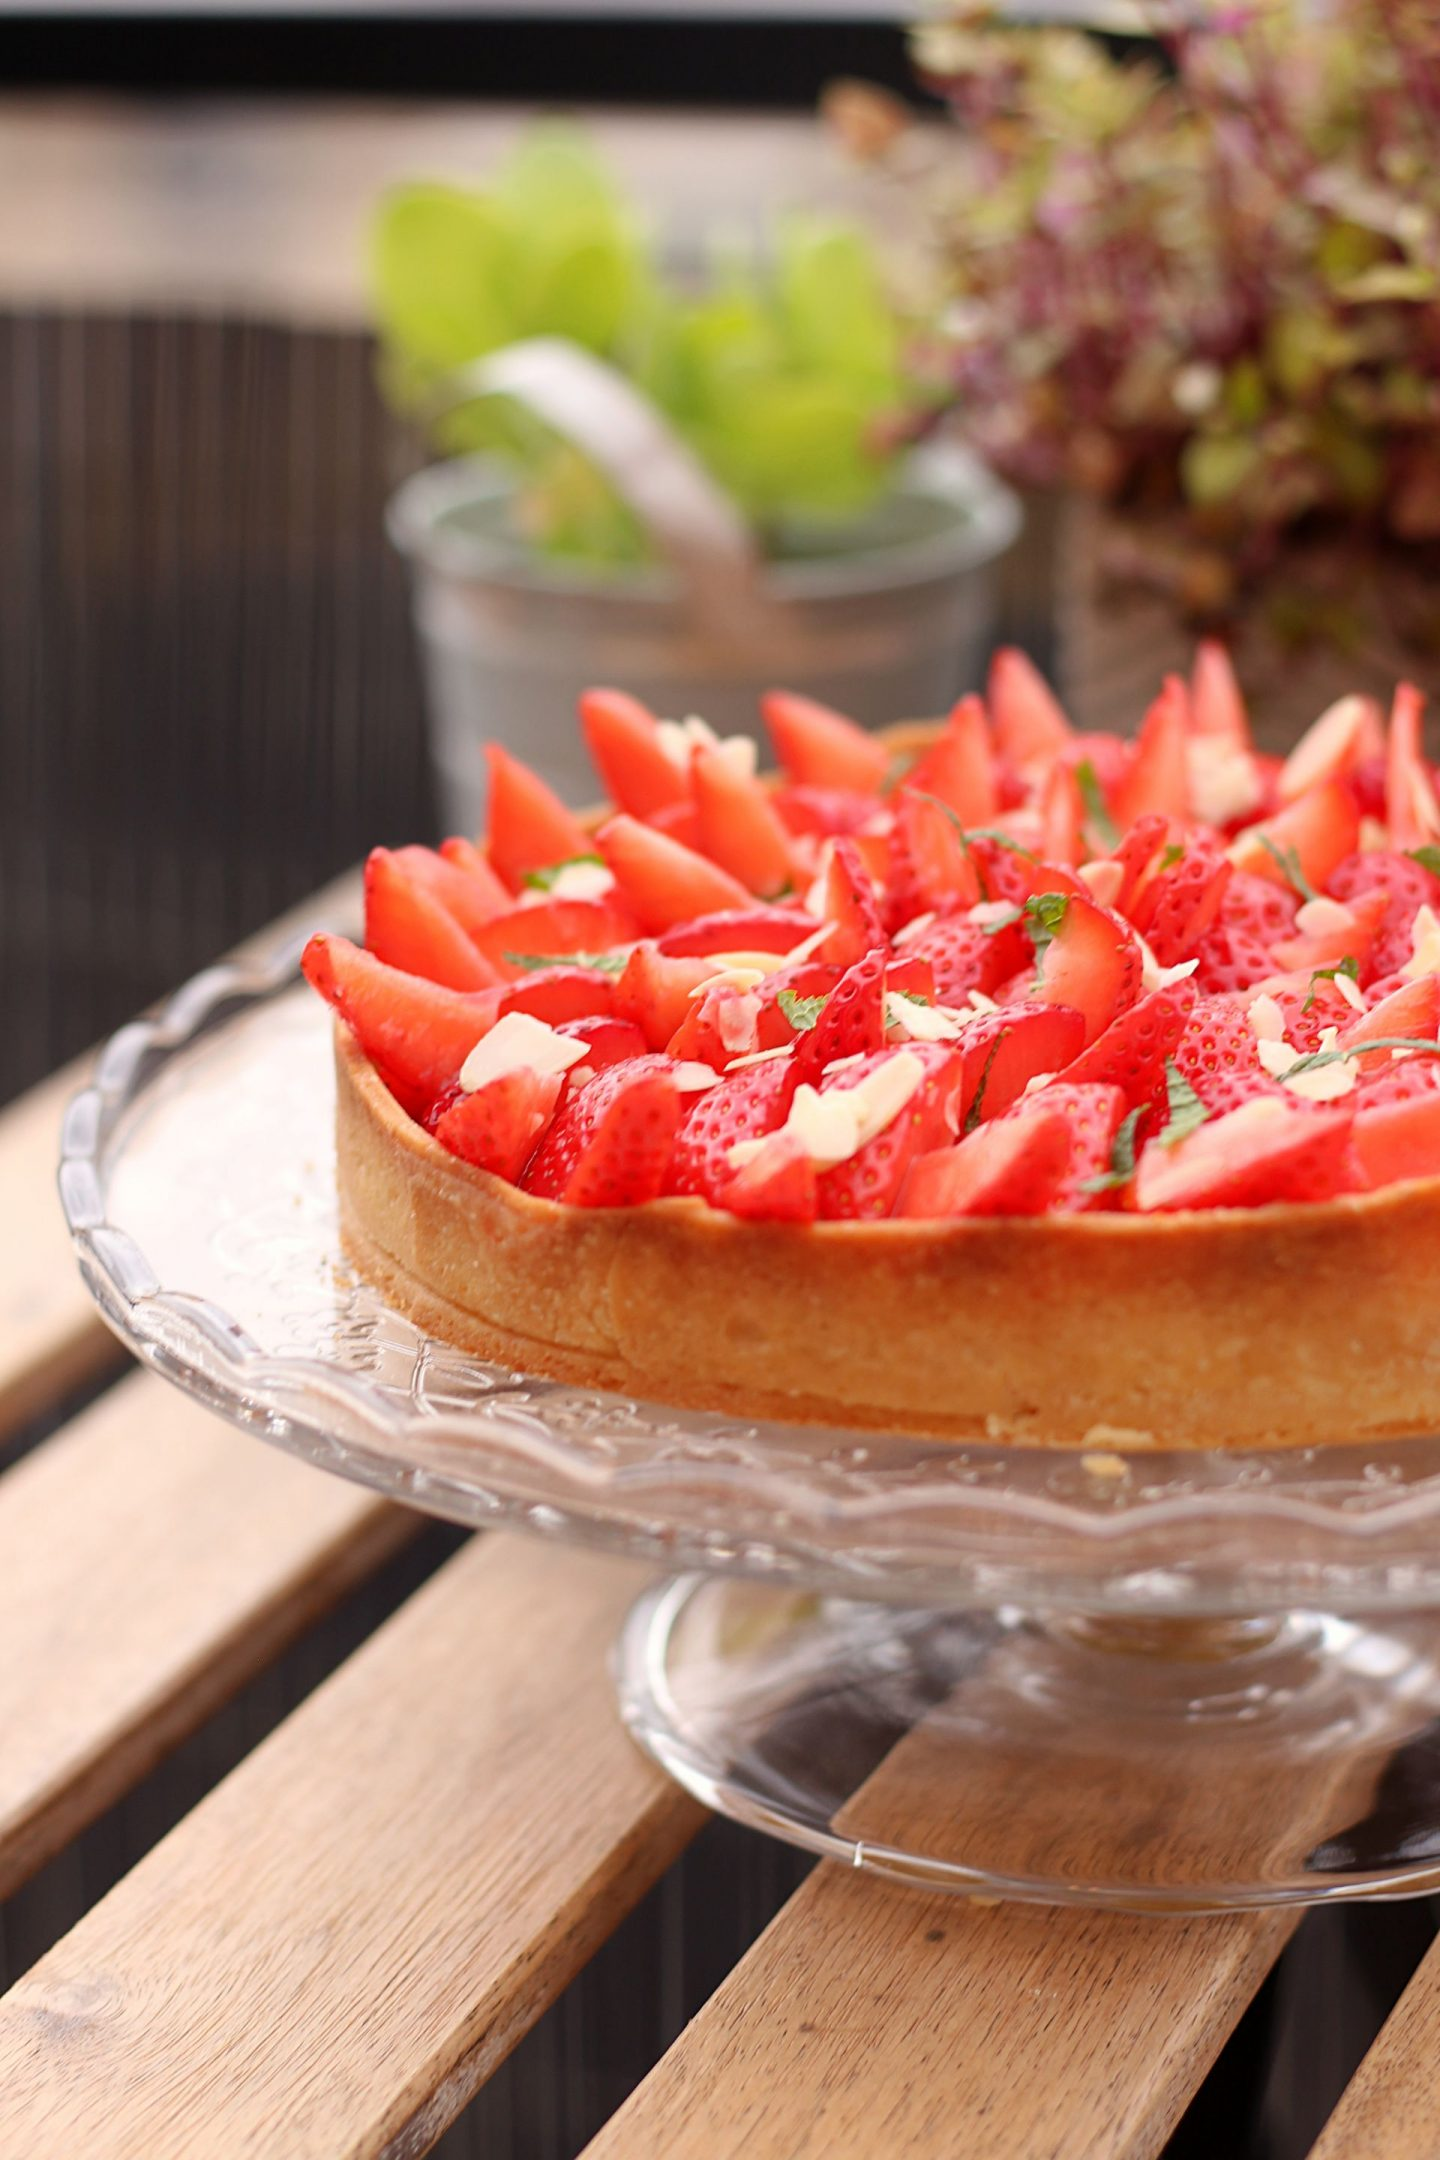 Recette facile tarte fraises amande